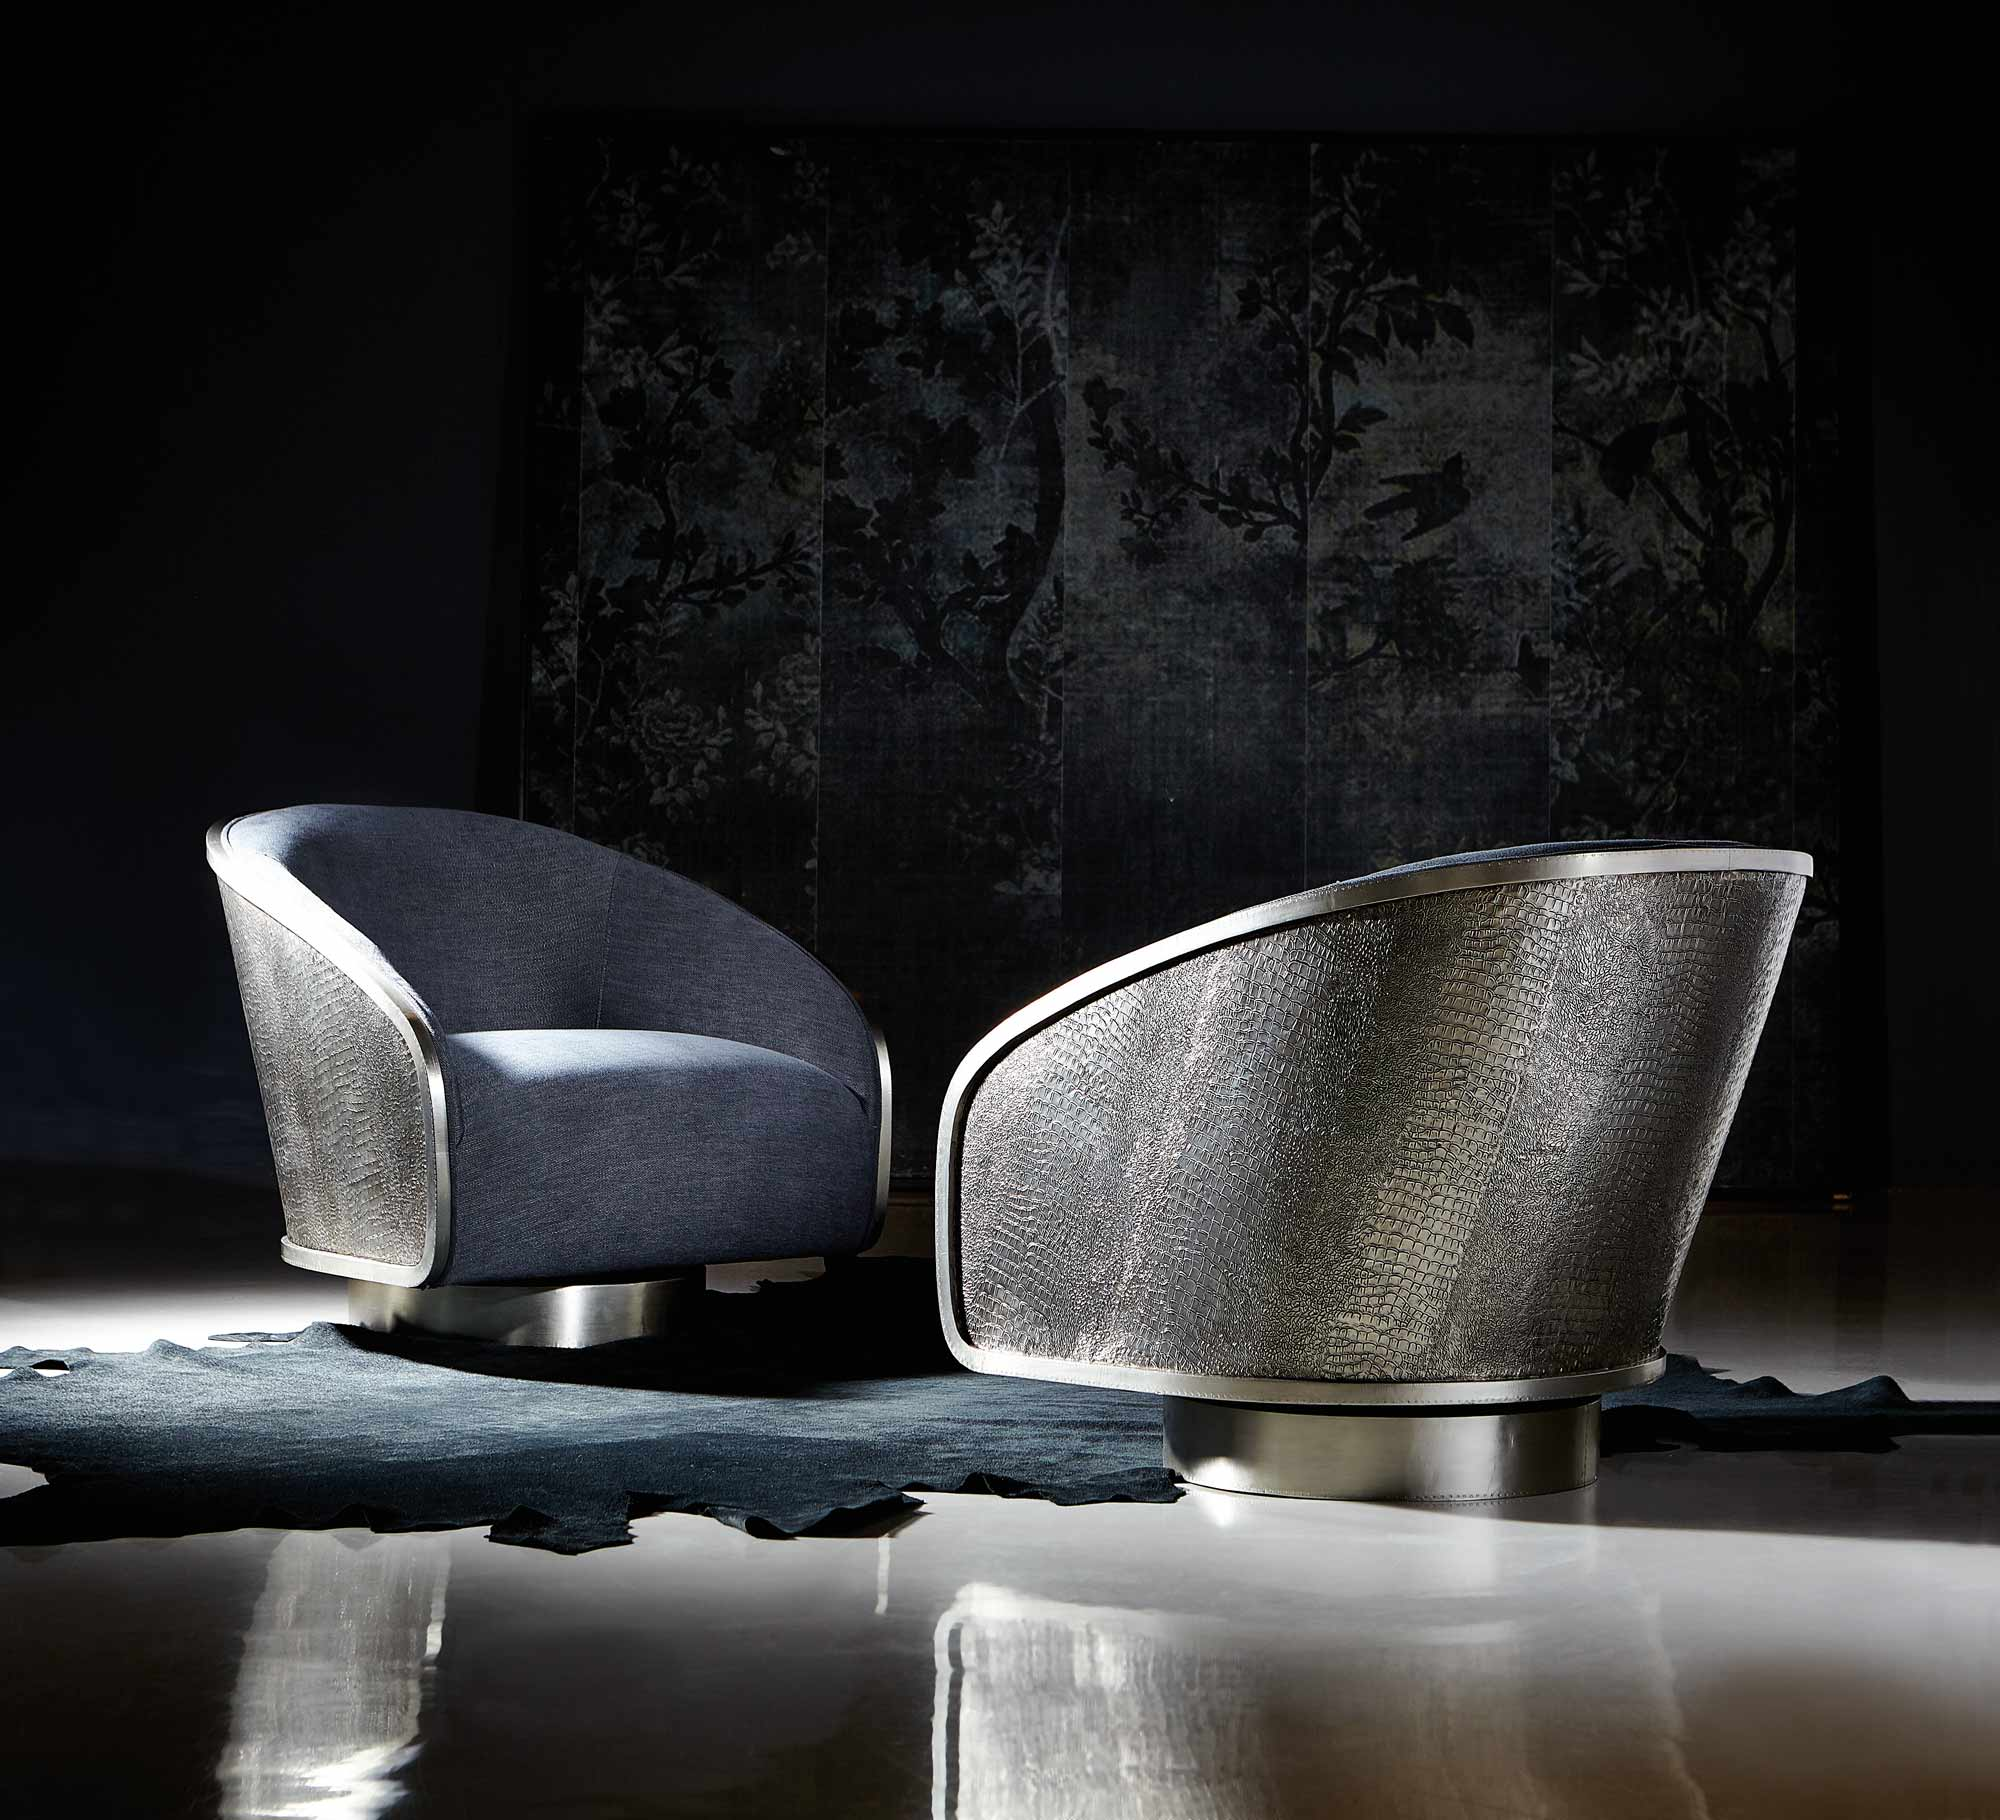 bernhardt_interiors_miles_image_gallery_01